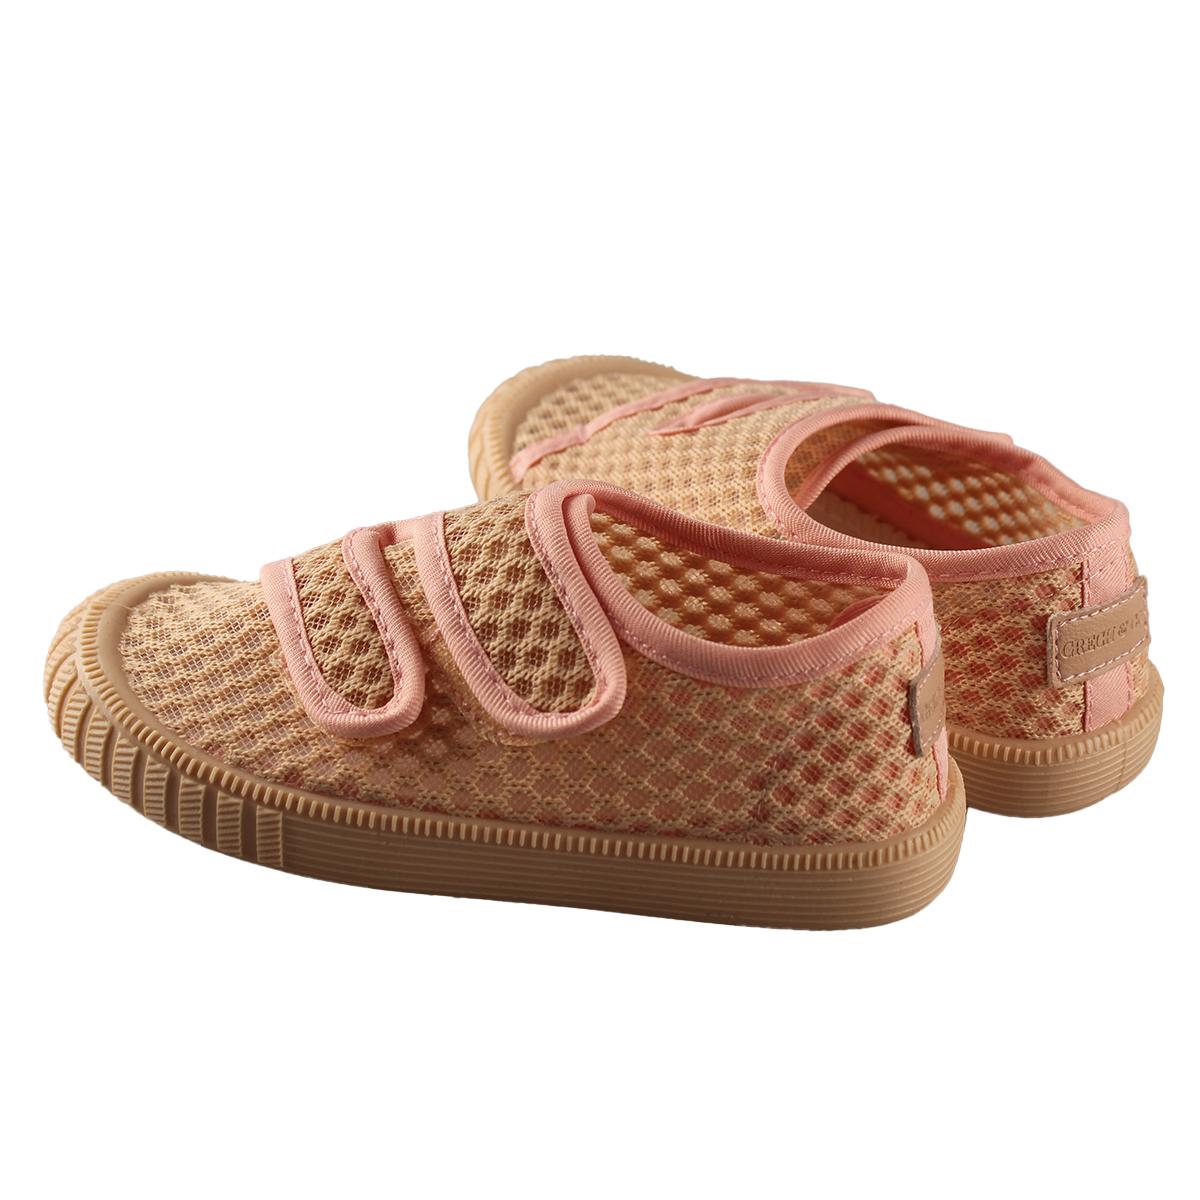 Chaussons & Chaussures Baskets Respirantes à Scratch Shell - 24 Baskets Respirantes à Scratch Shell - 24